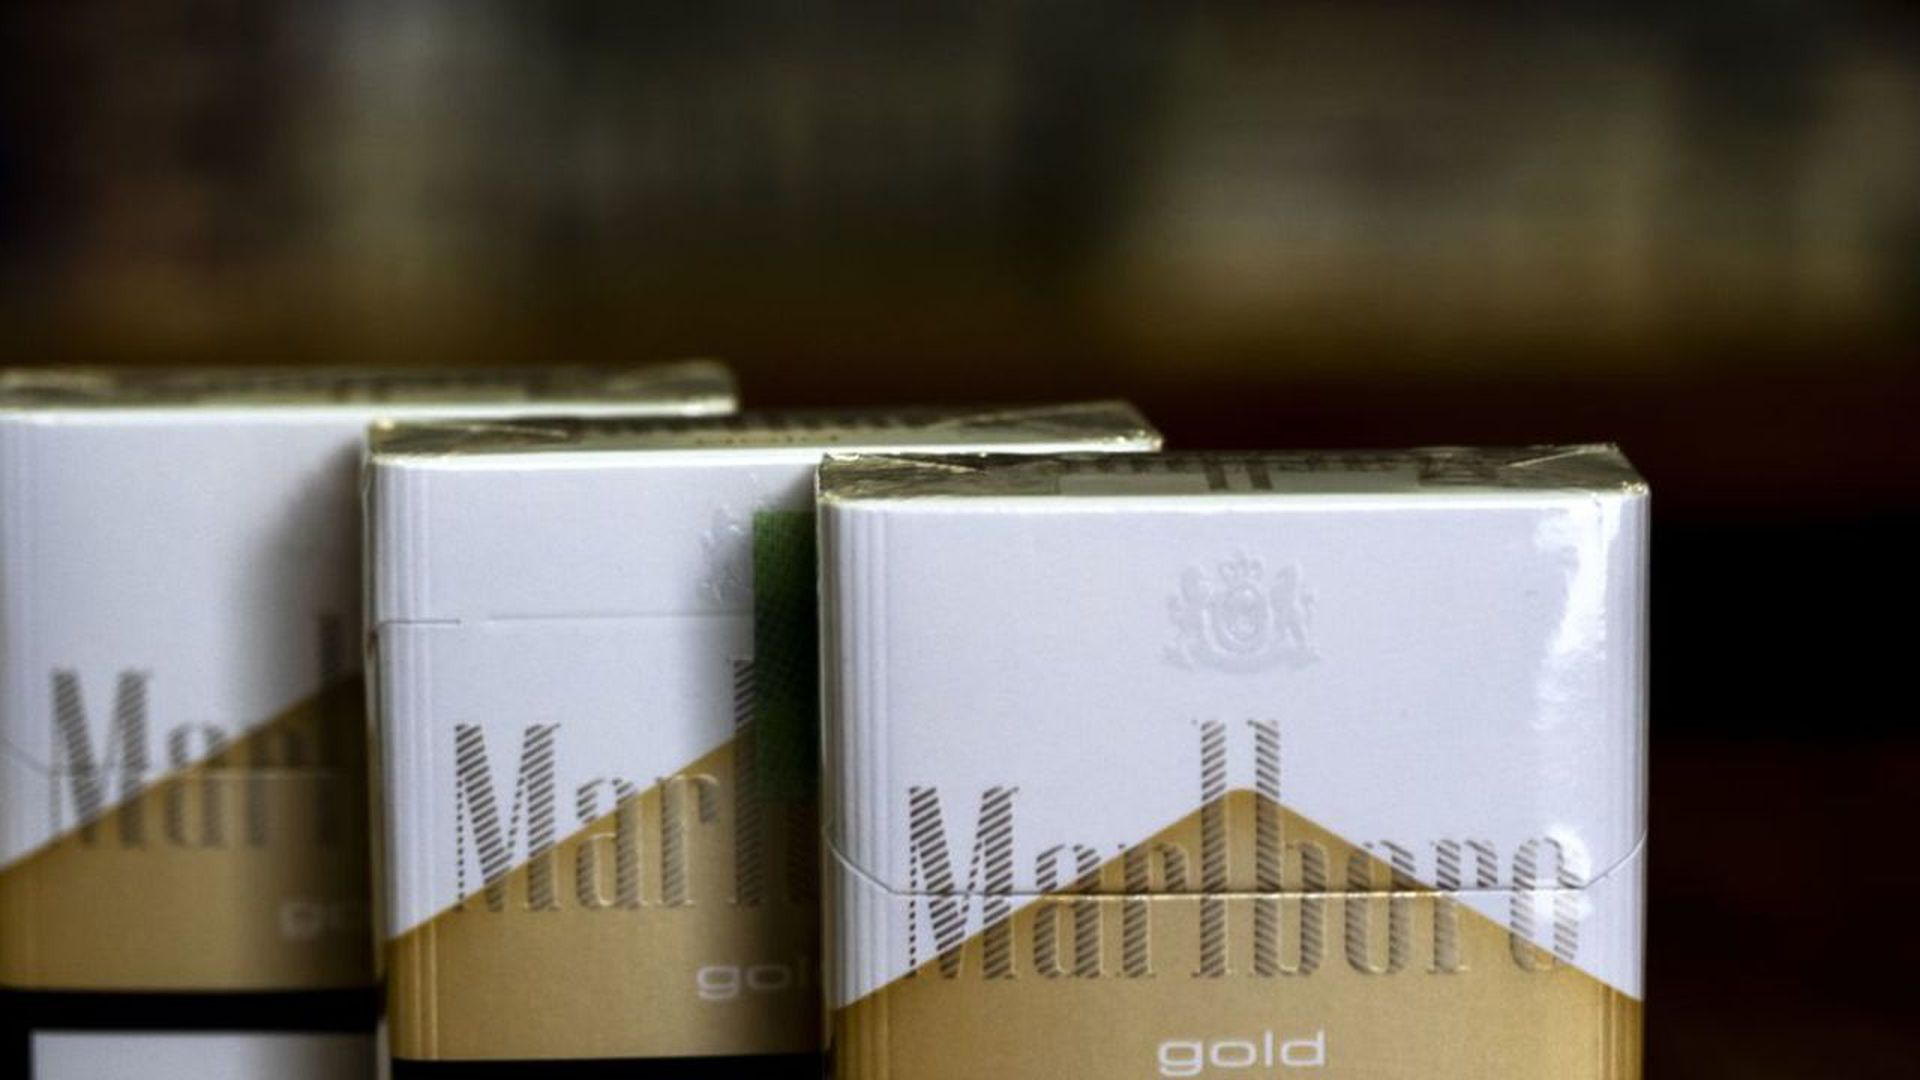 three packs of marlboro gold cigarettes